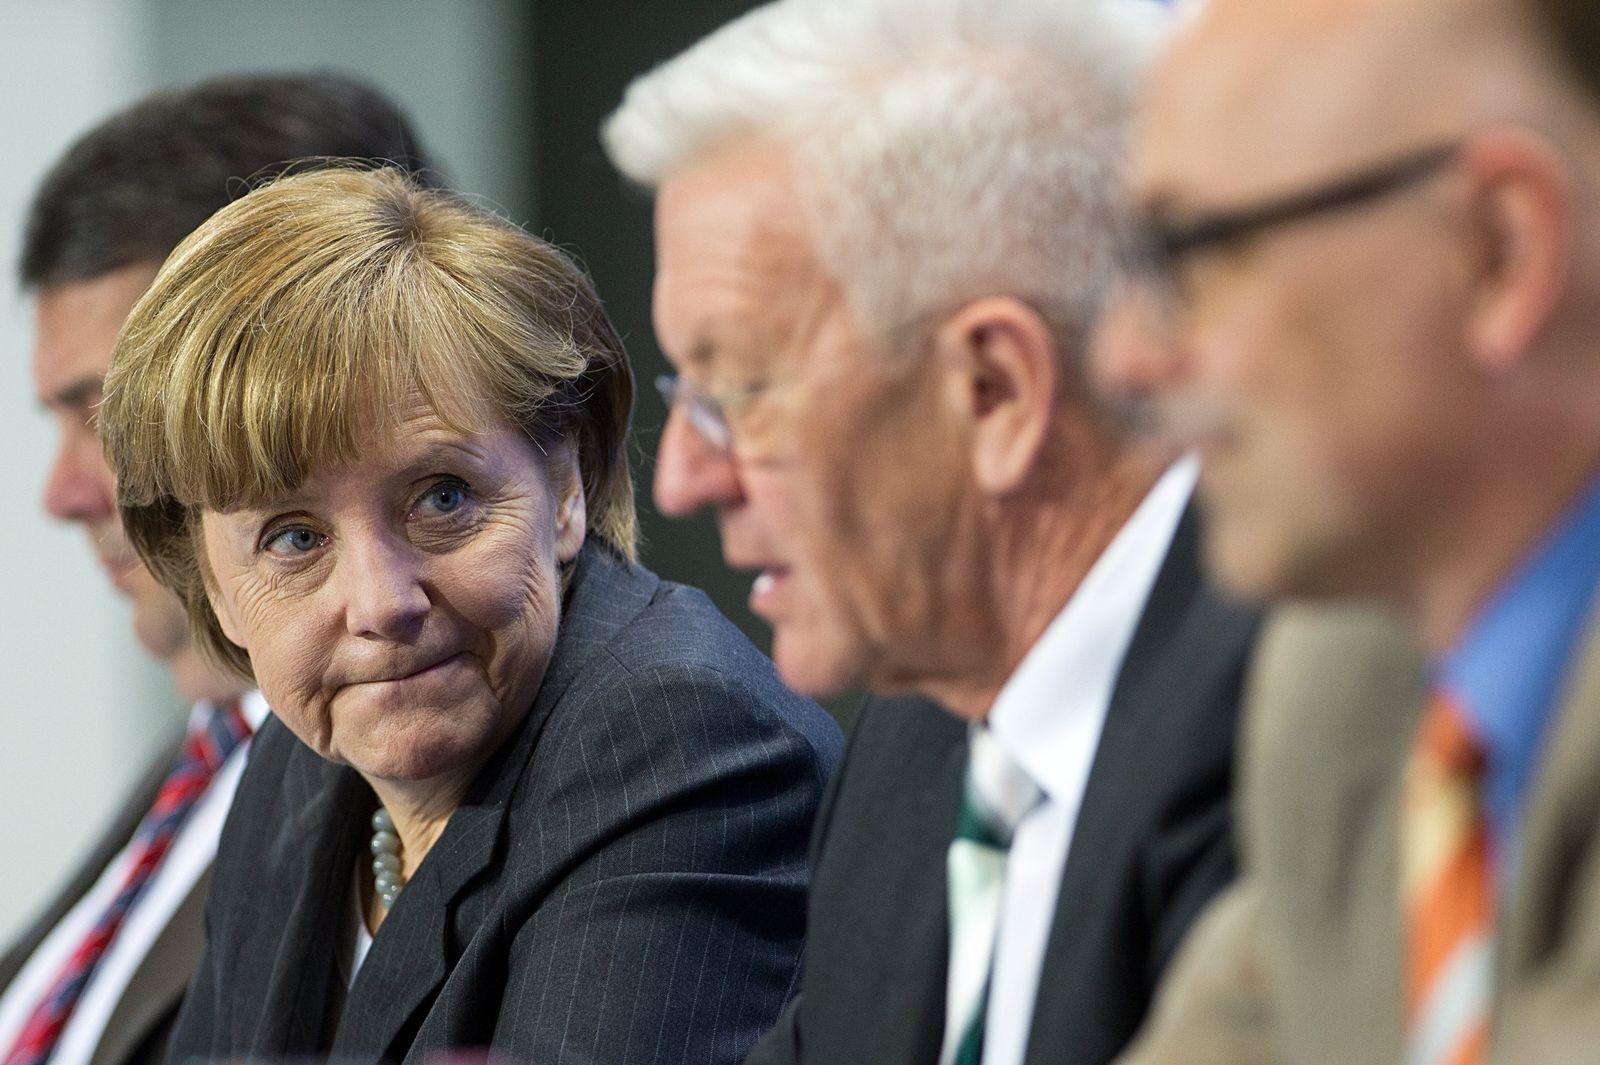 Energiegipfel Merkel Gabriel Kretschmann Albig